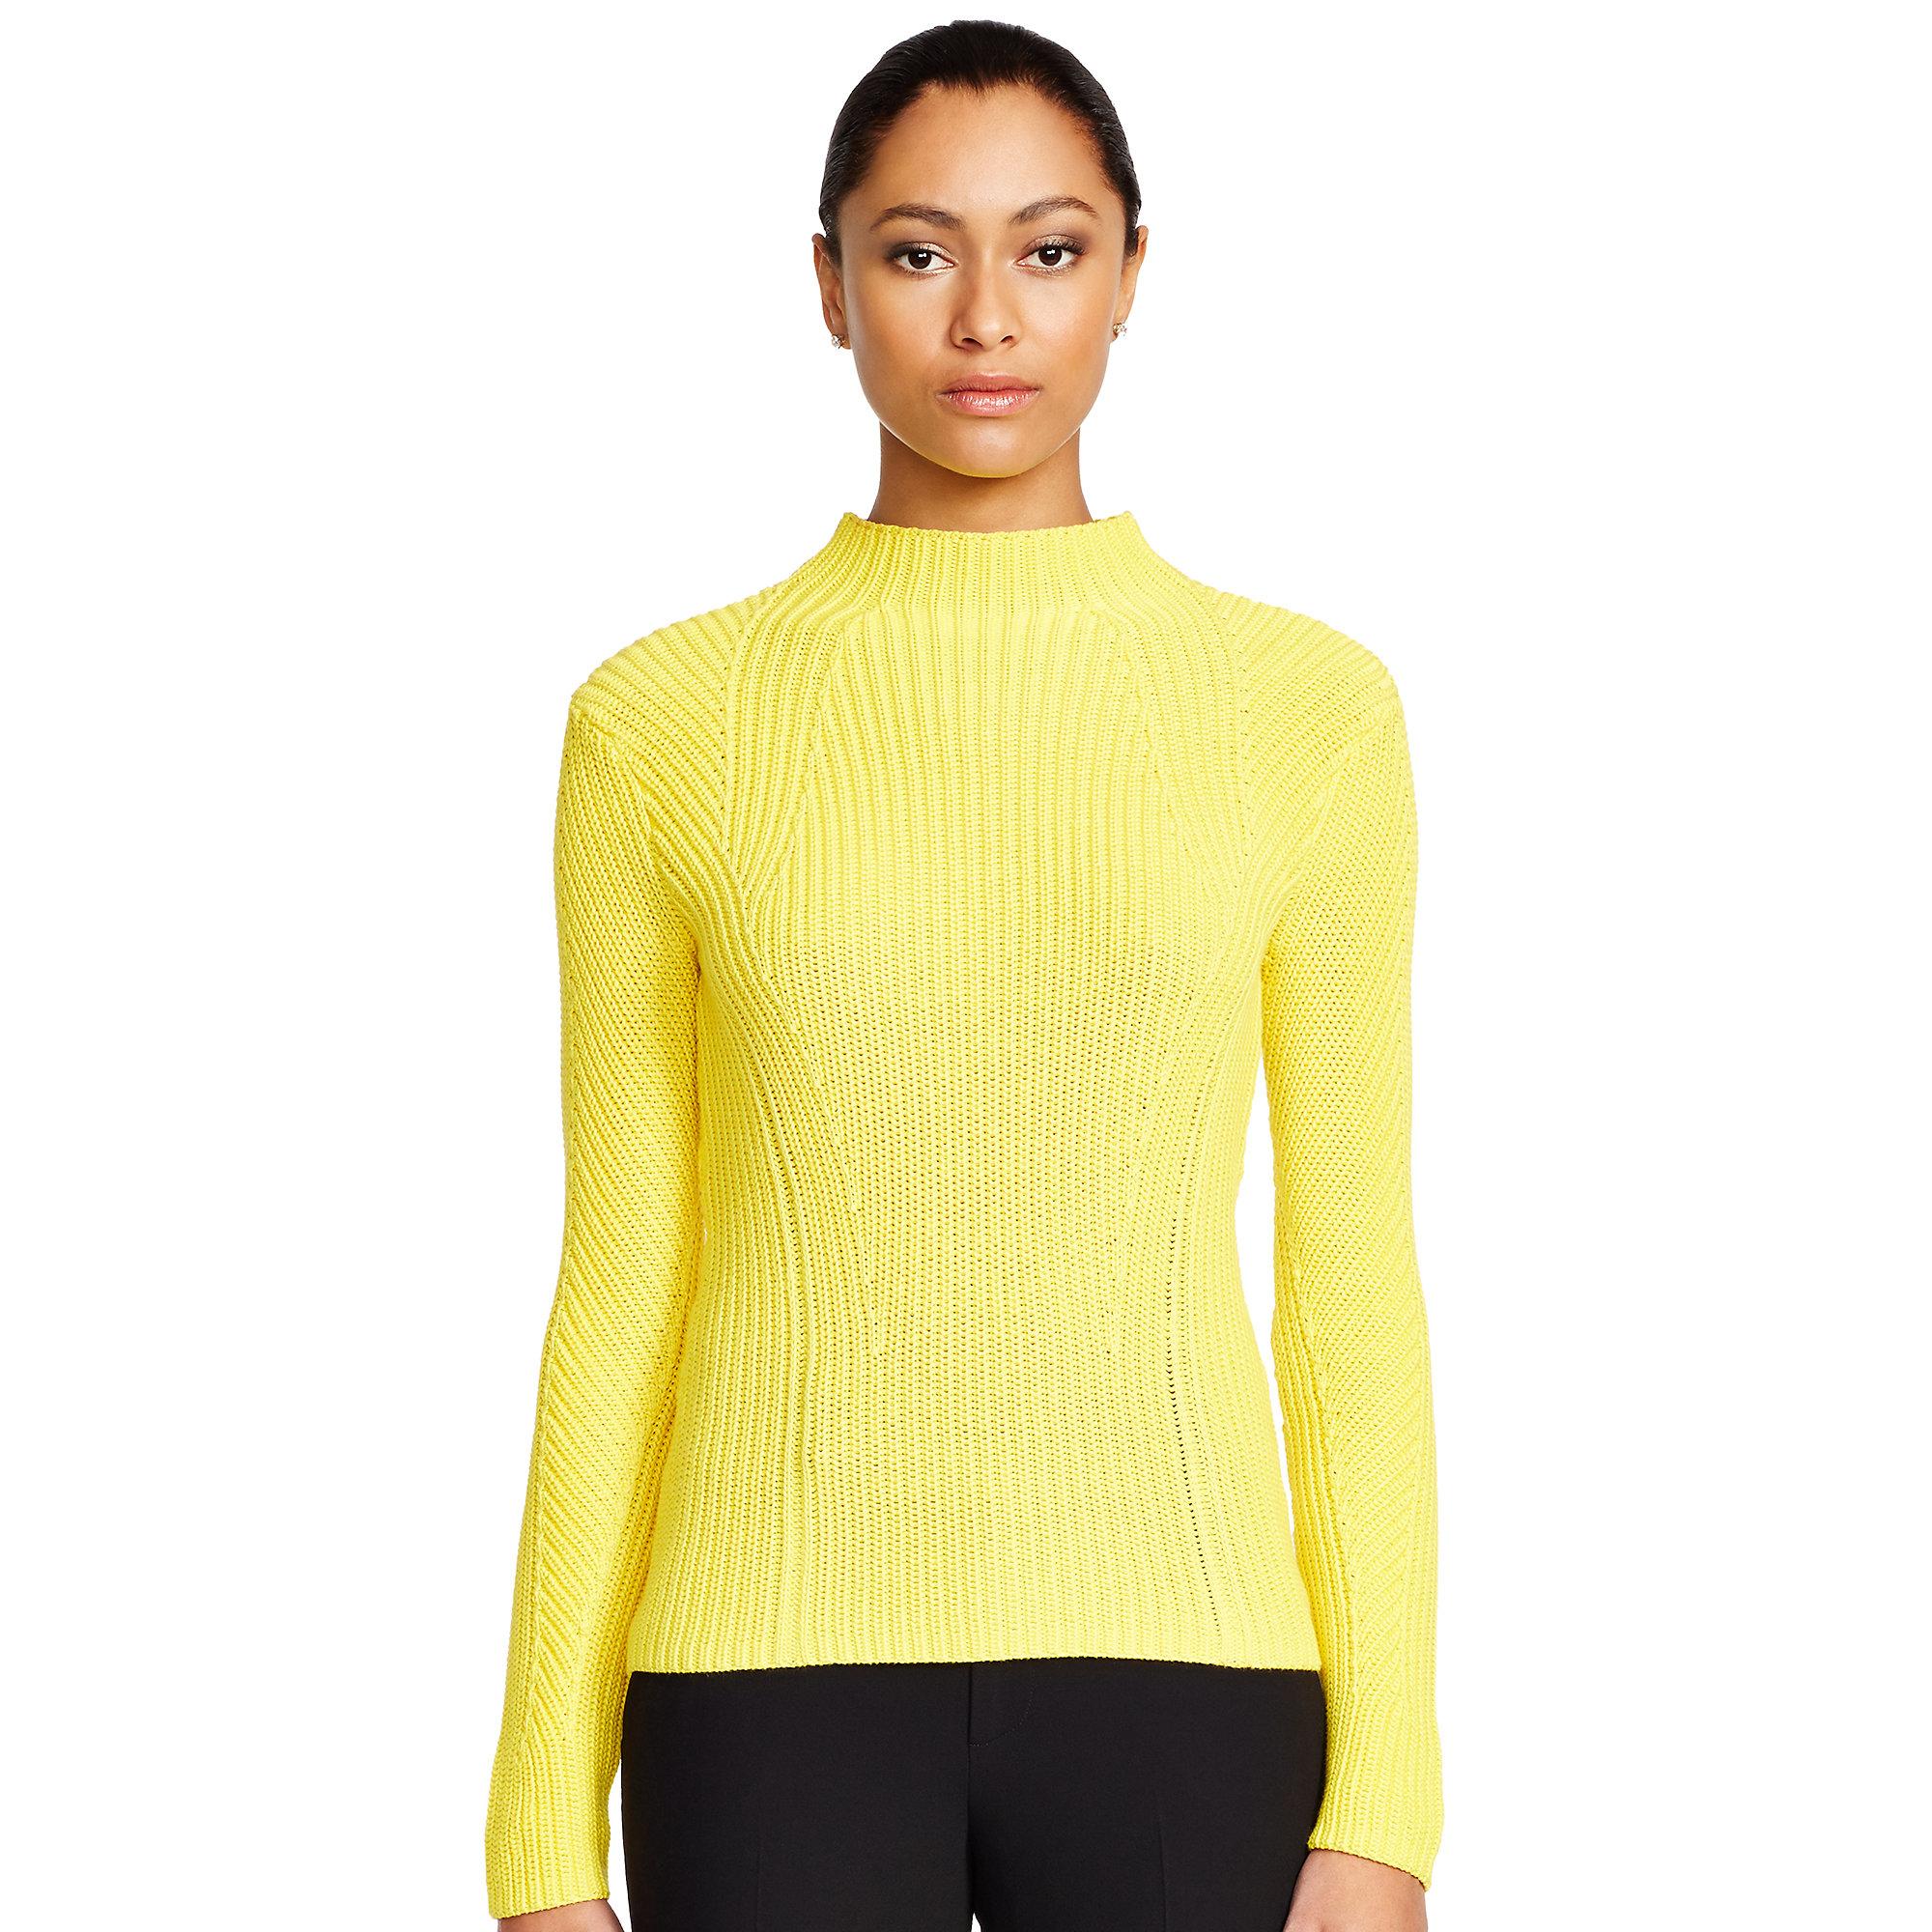 Ralph lauren black label Cotton-silk Mockneck Sweater in Yellow | Lyst